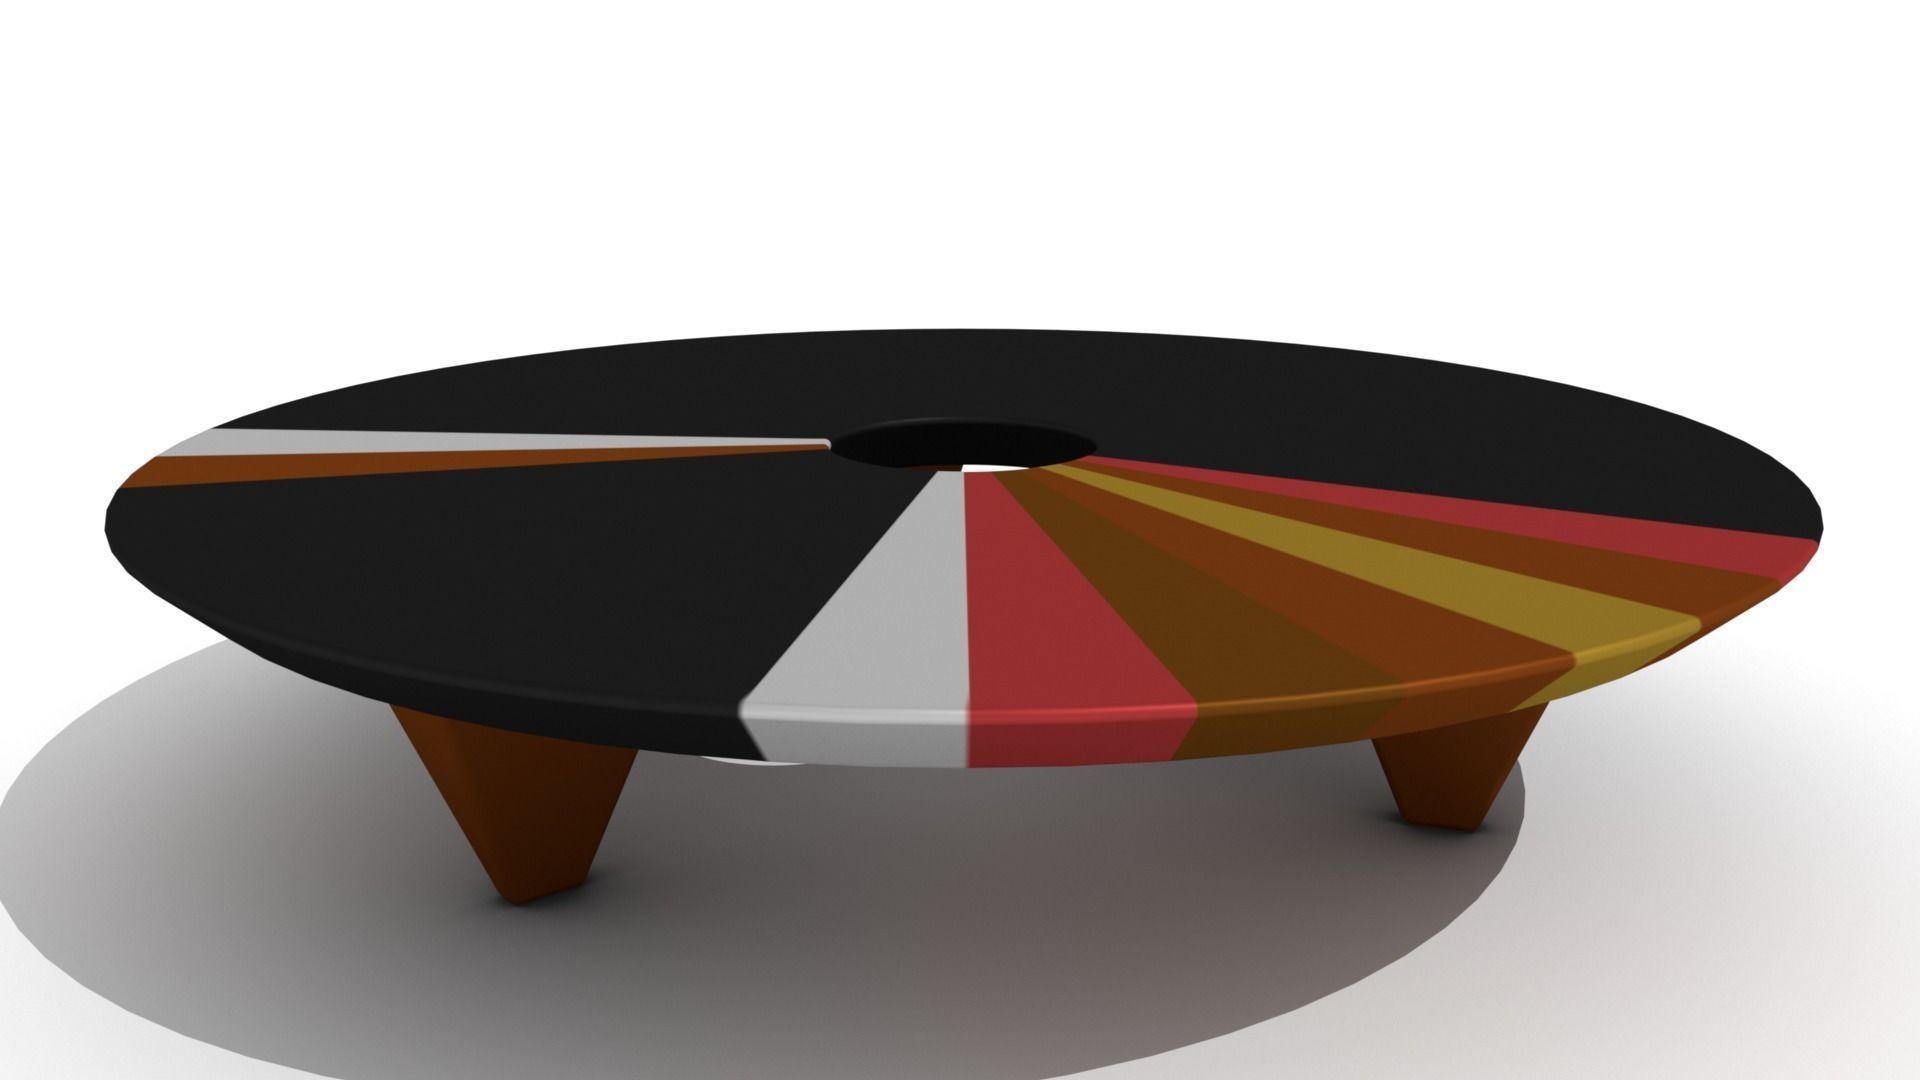 Marvelous Retro Low Wooden Ring Coffee Table 3D Model Evergreenethics Interior Chair Design Evergreenethicsorg